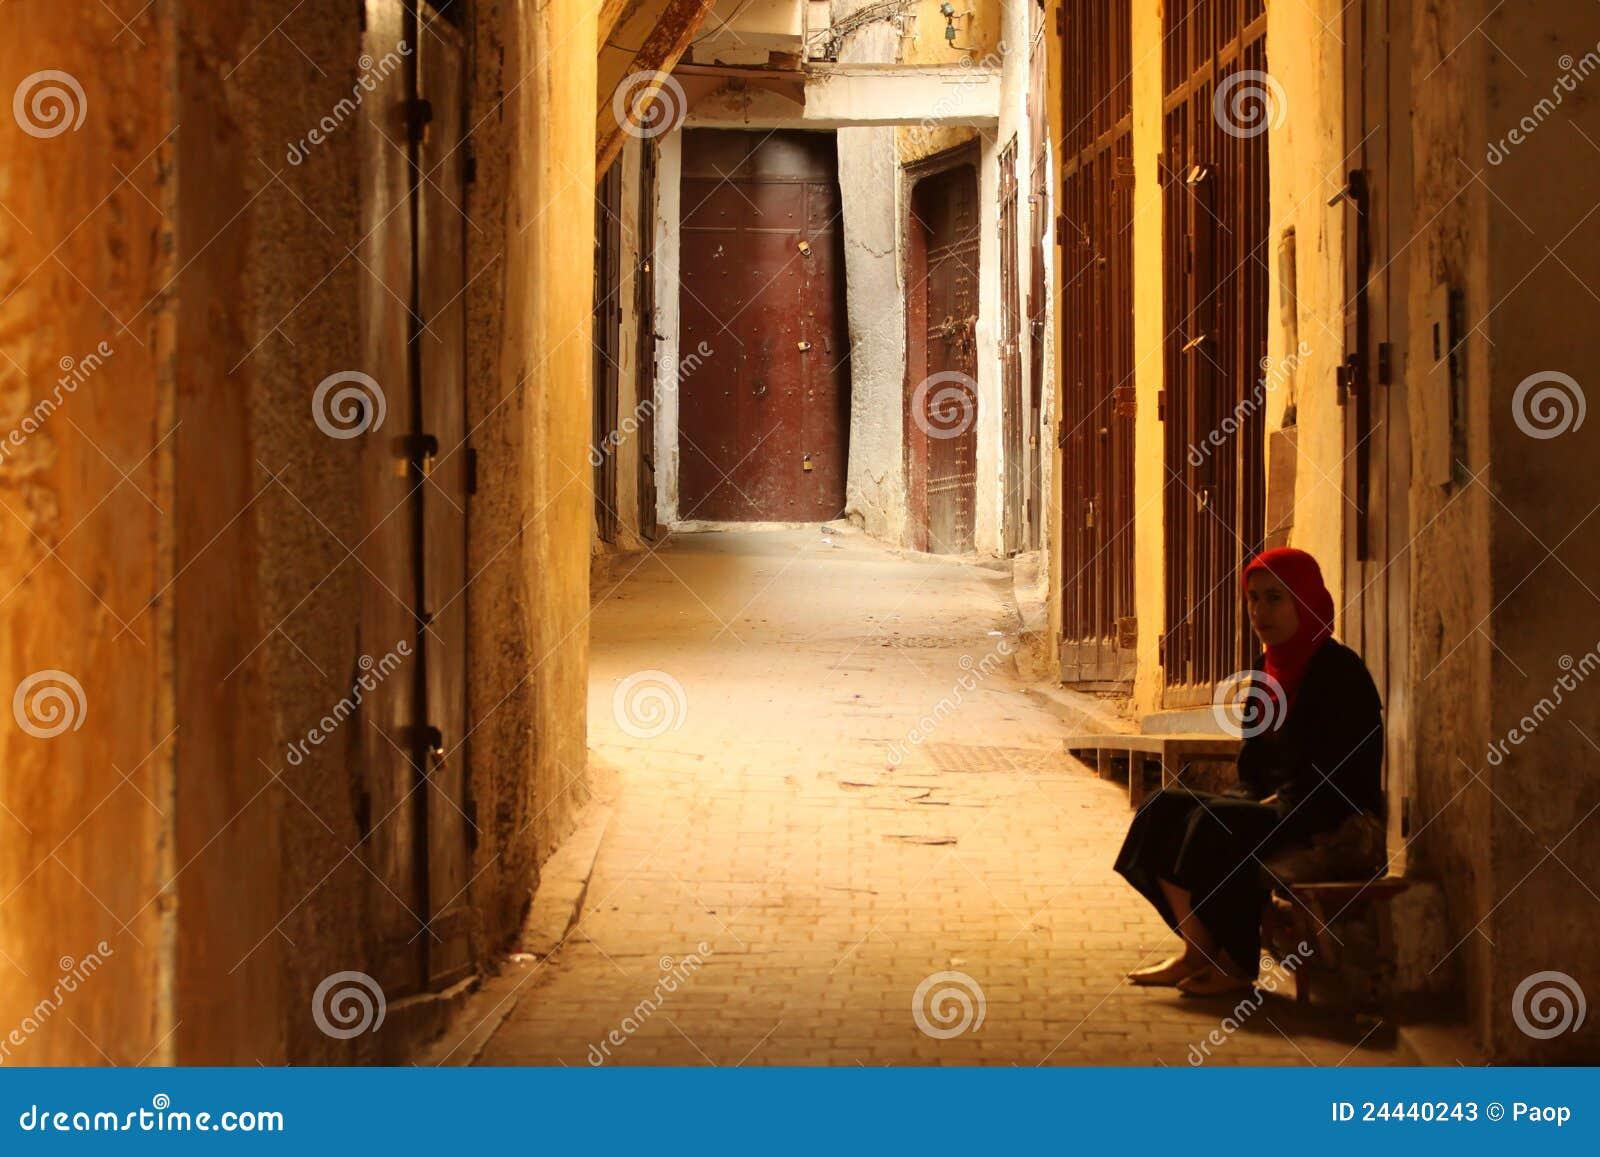 gallatin gateway single muslim girls Home / staff office estevez, katherine edd (principal) gallatin elementary school 9513 brookshire avenue downey, ca 90240 phone: 562-904-3583.